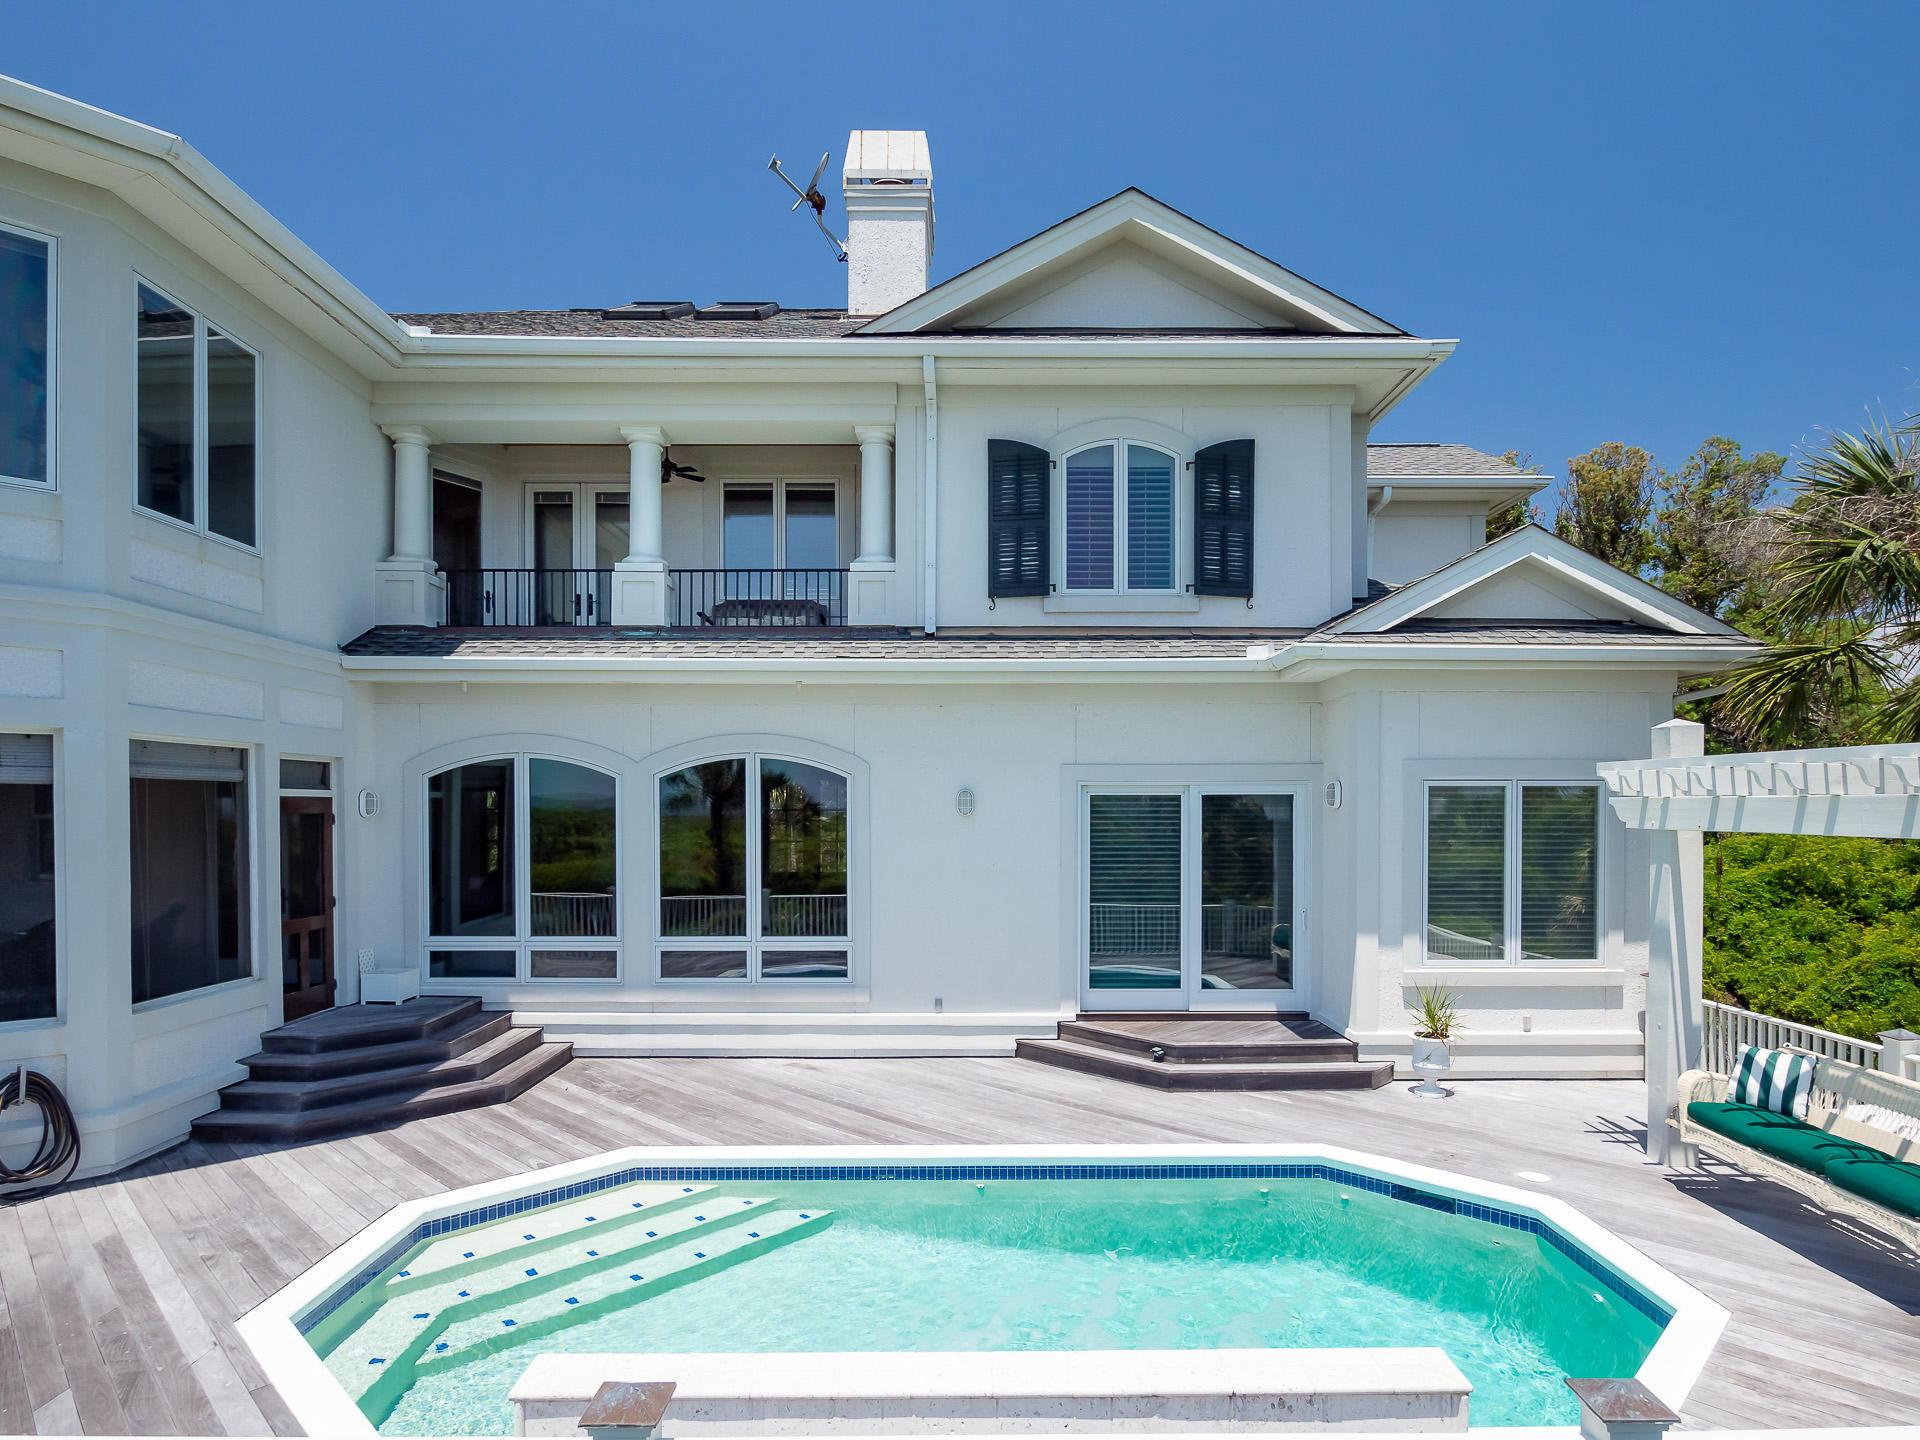 Seabrook Island Homes For Sale - 2216 Rolling Dune, Seabrook Island, SC - 56